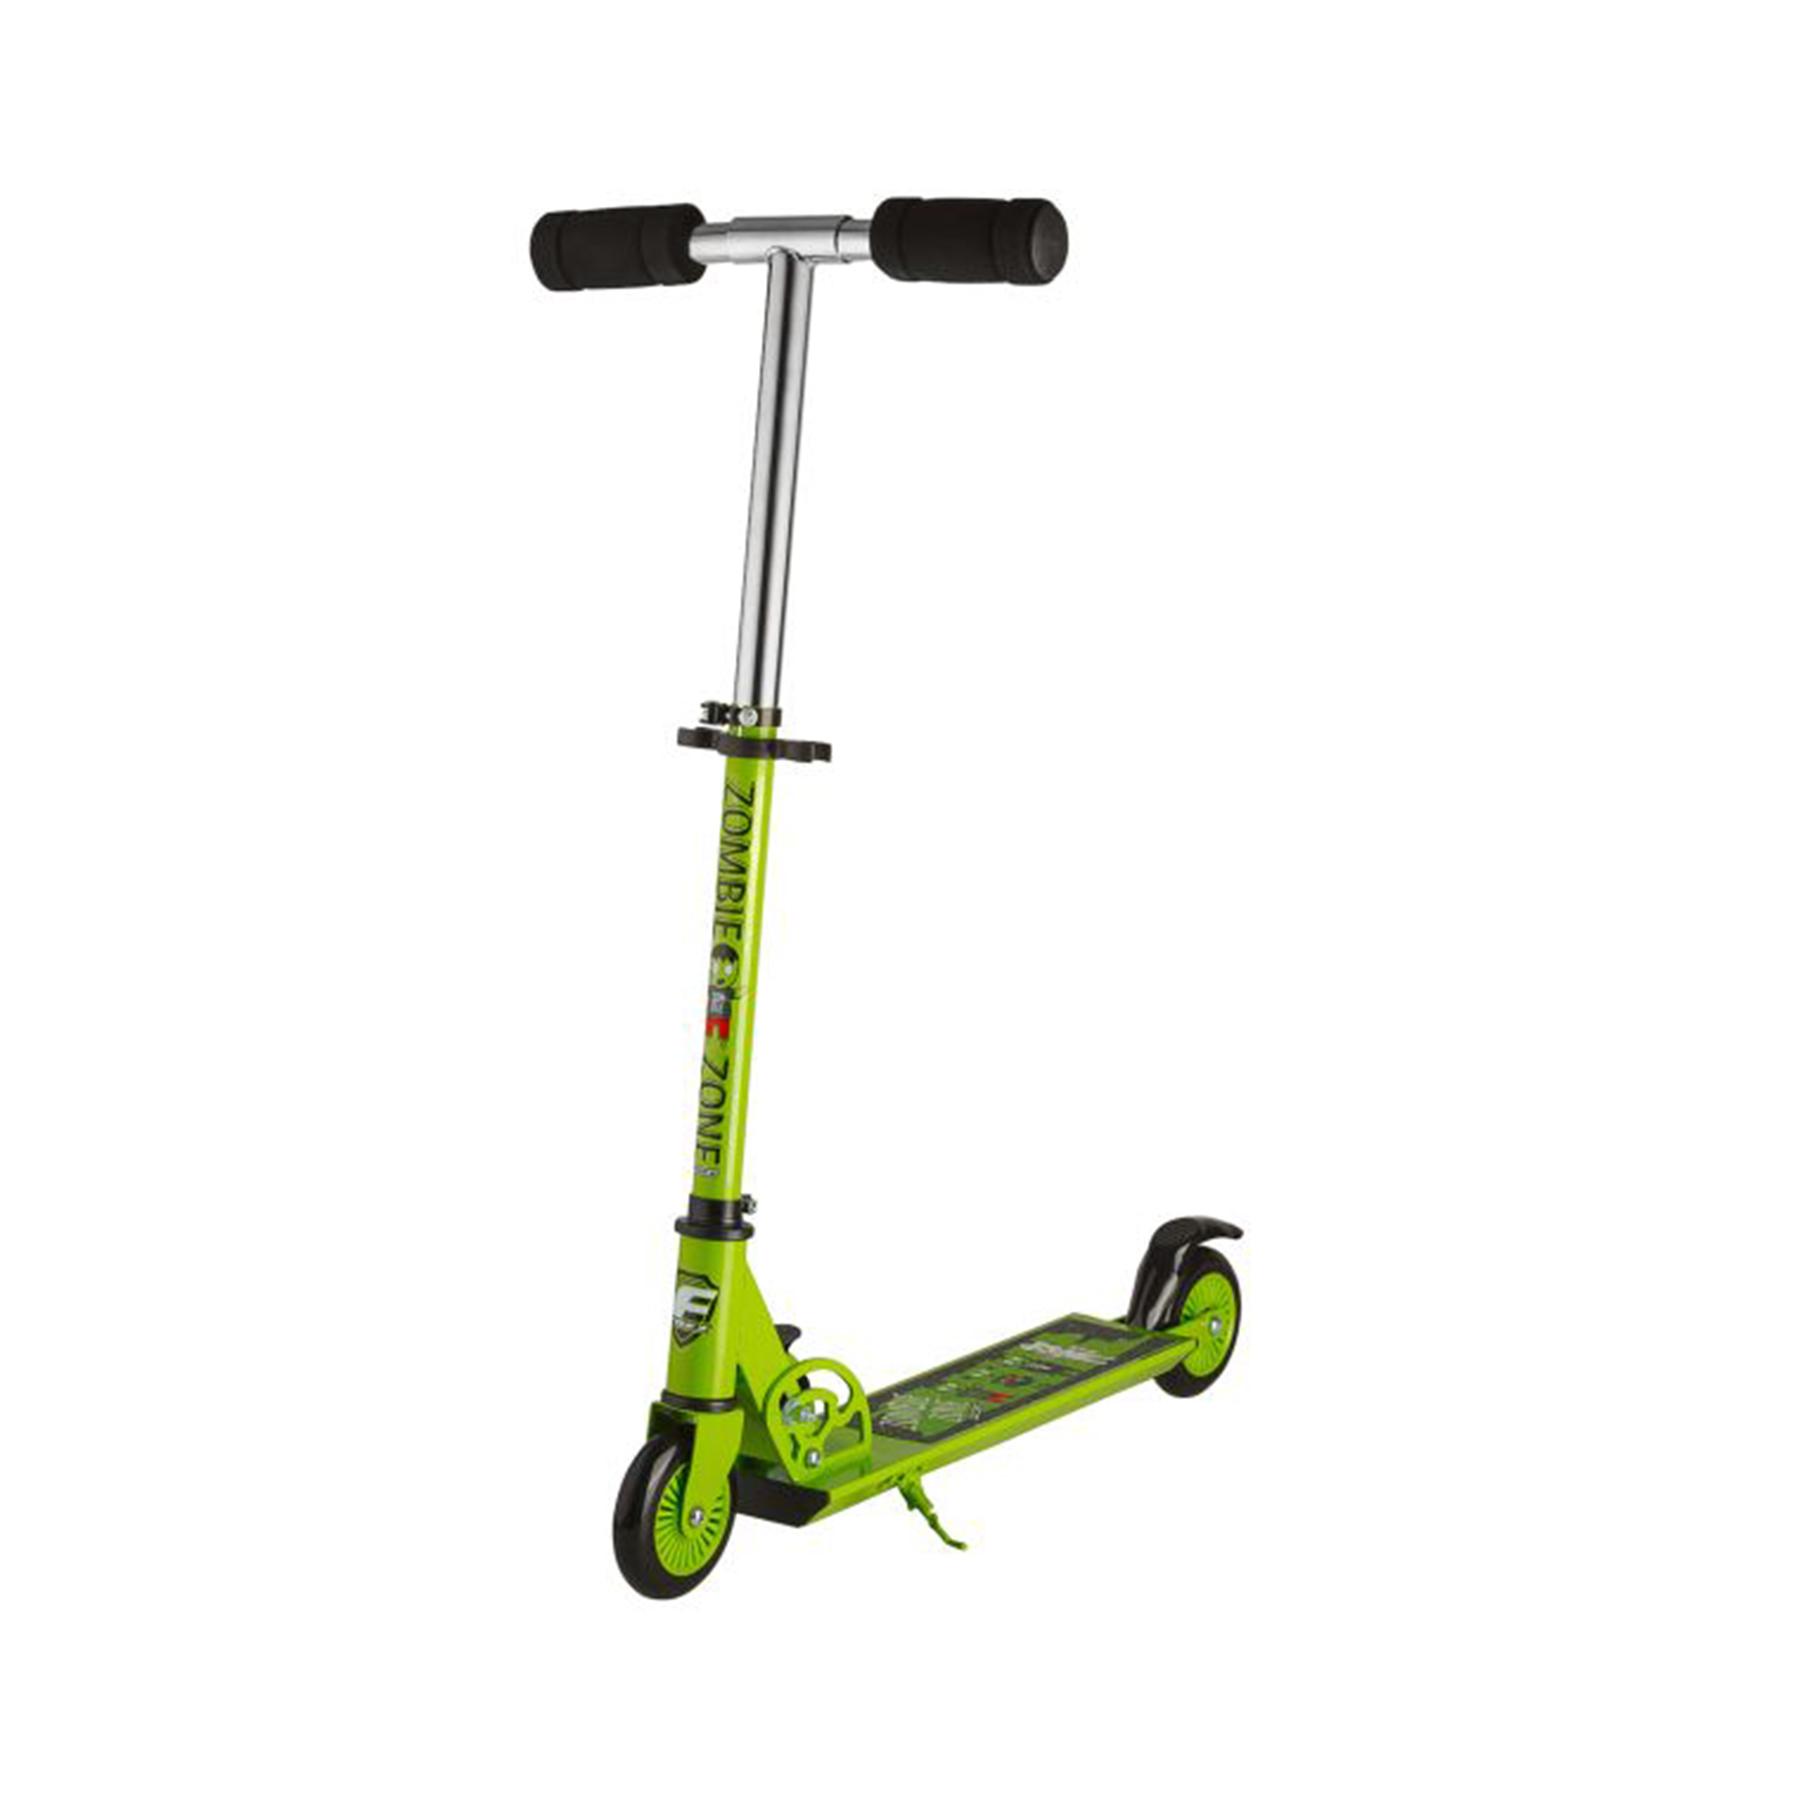 Самокат Foxx Zomby Zone алюм+сталь,колеса 100мм,ABEC-7 (зеленый) 117763